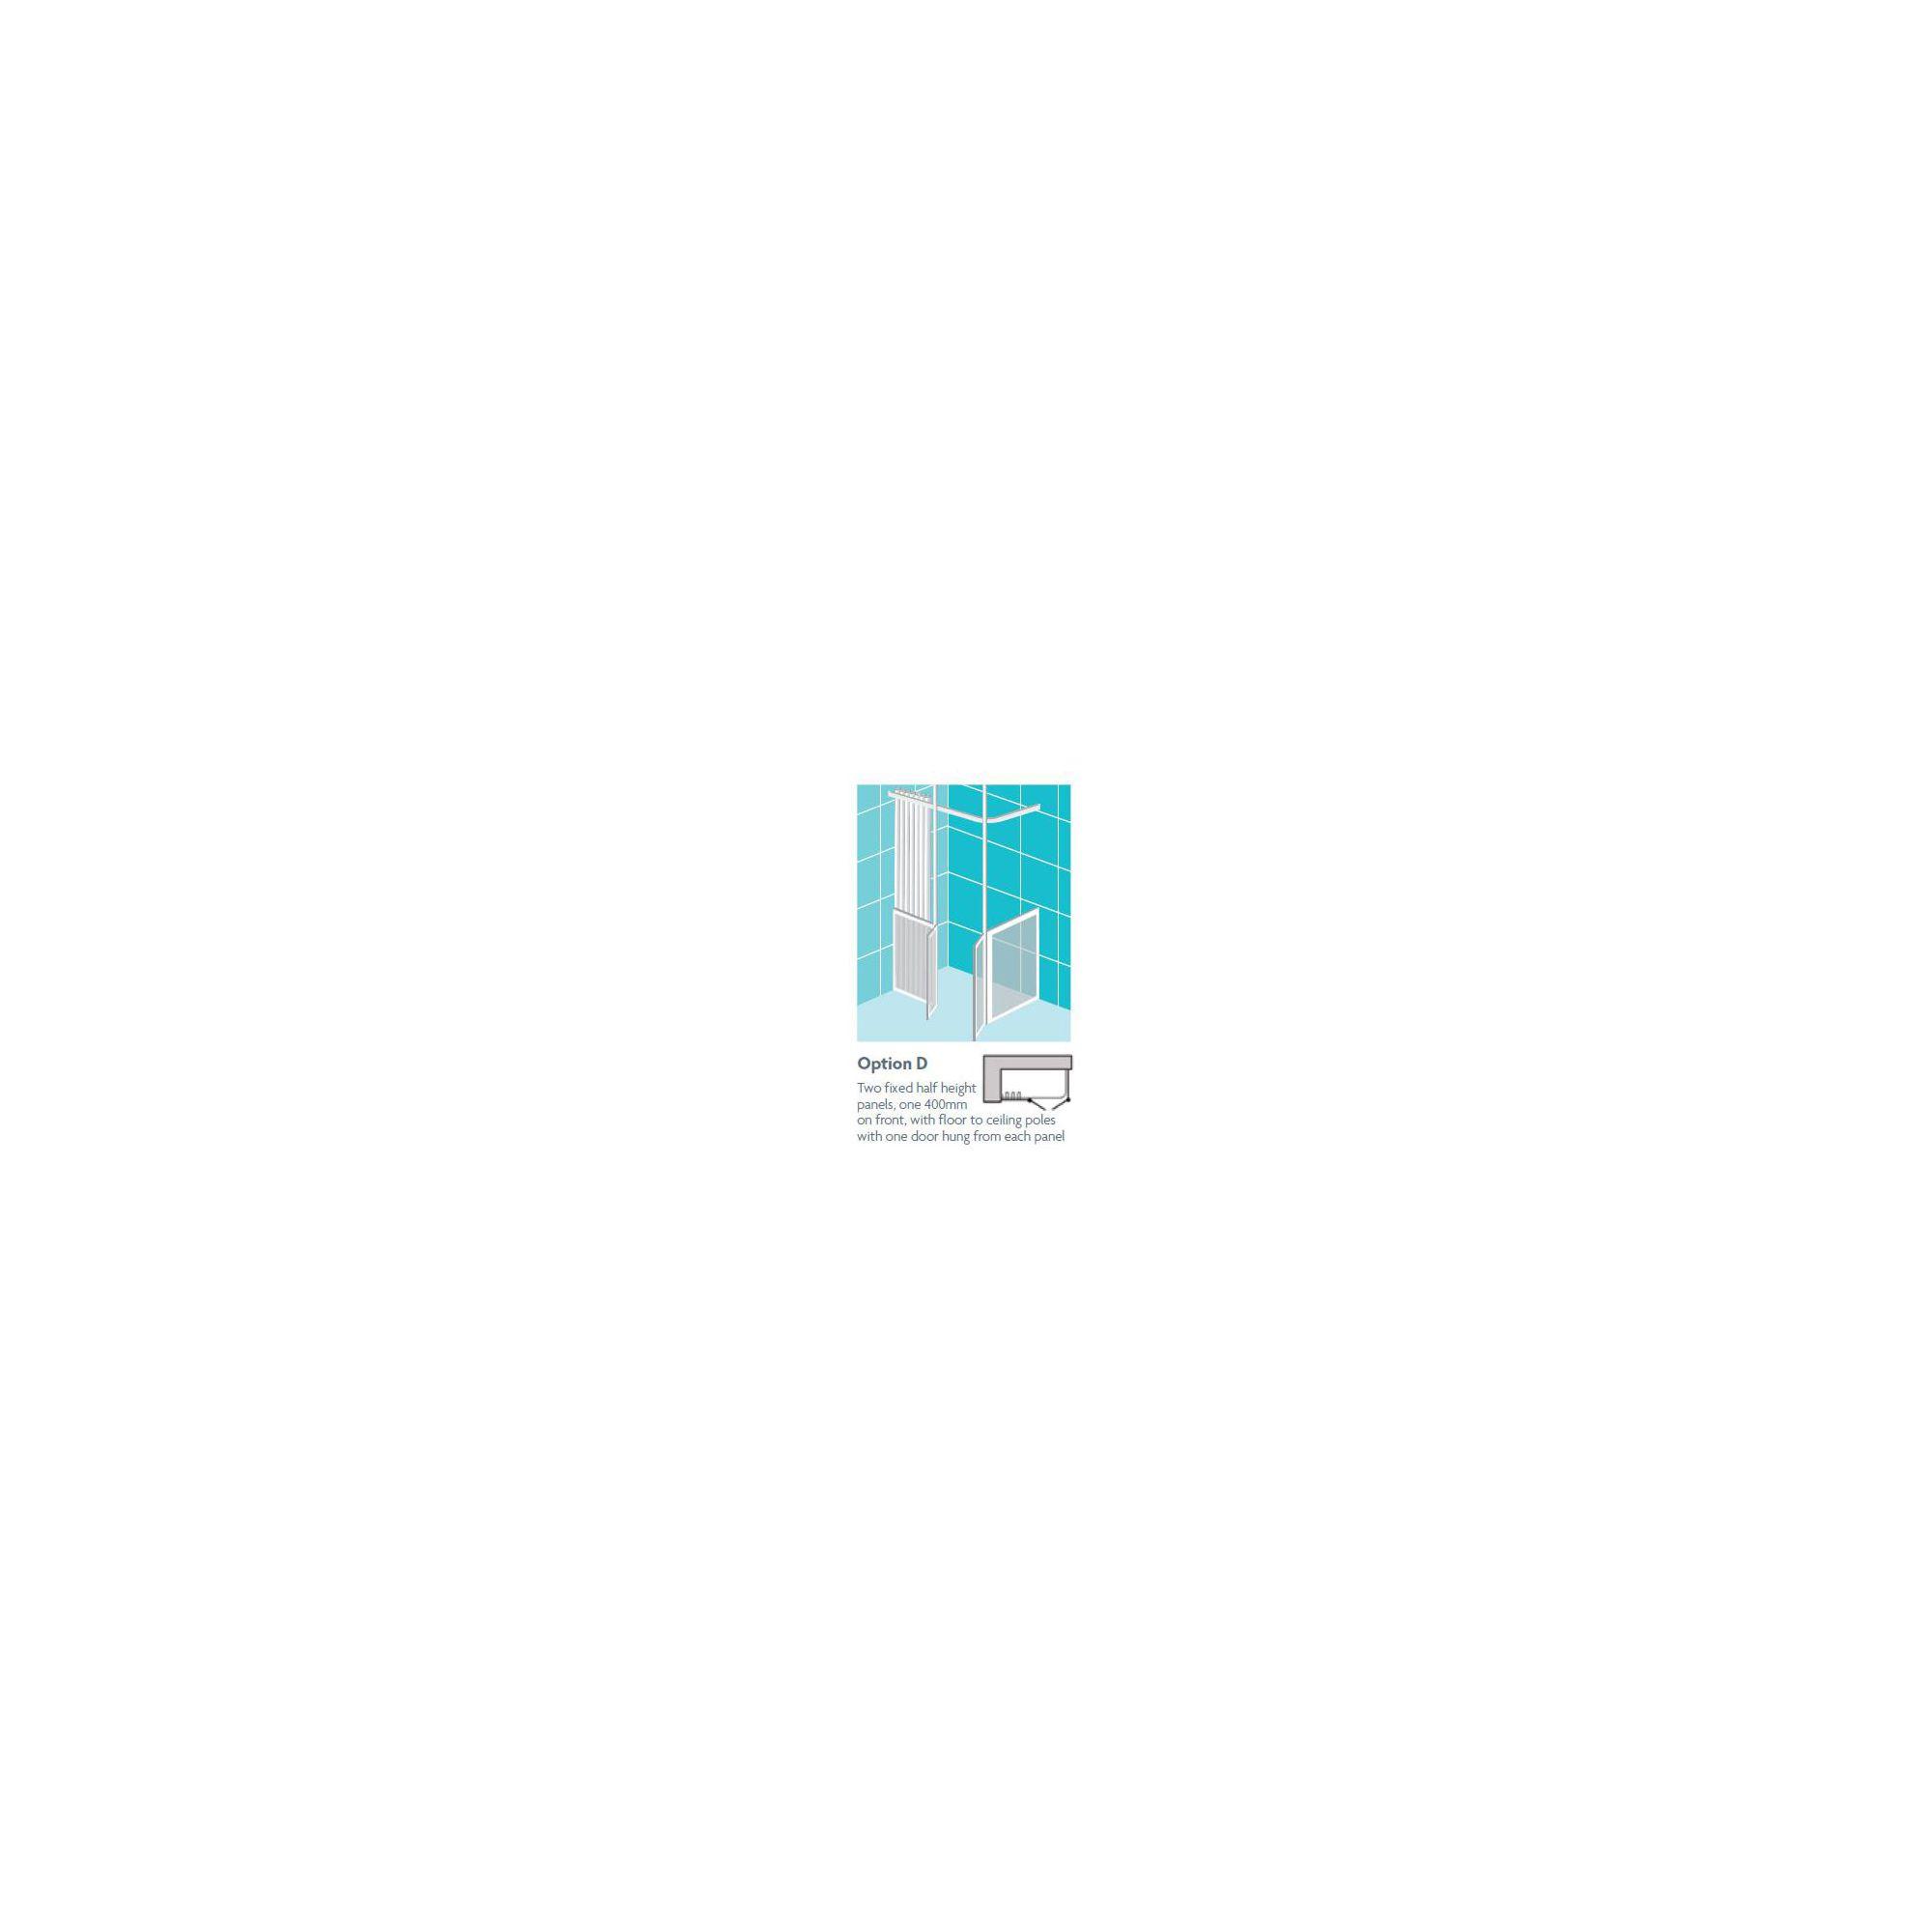 Impey Supreme Corner Door Option D Left Hand 1500mm x 710mm at Tescos Direct